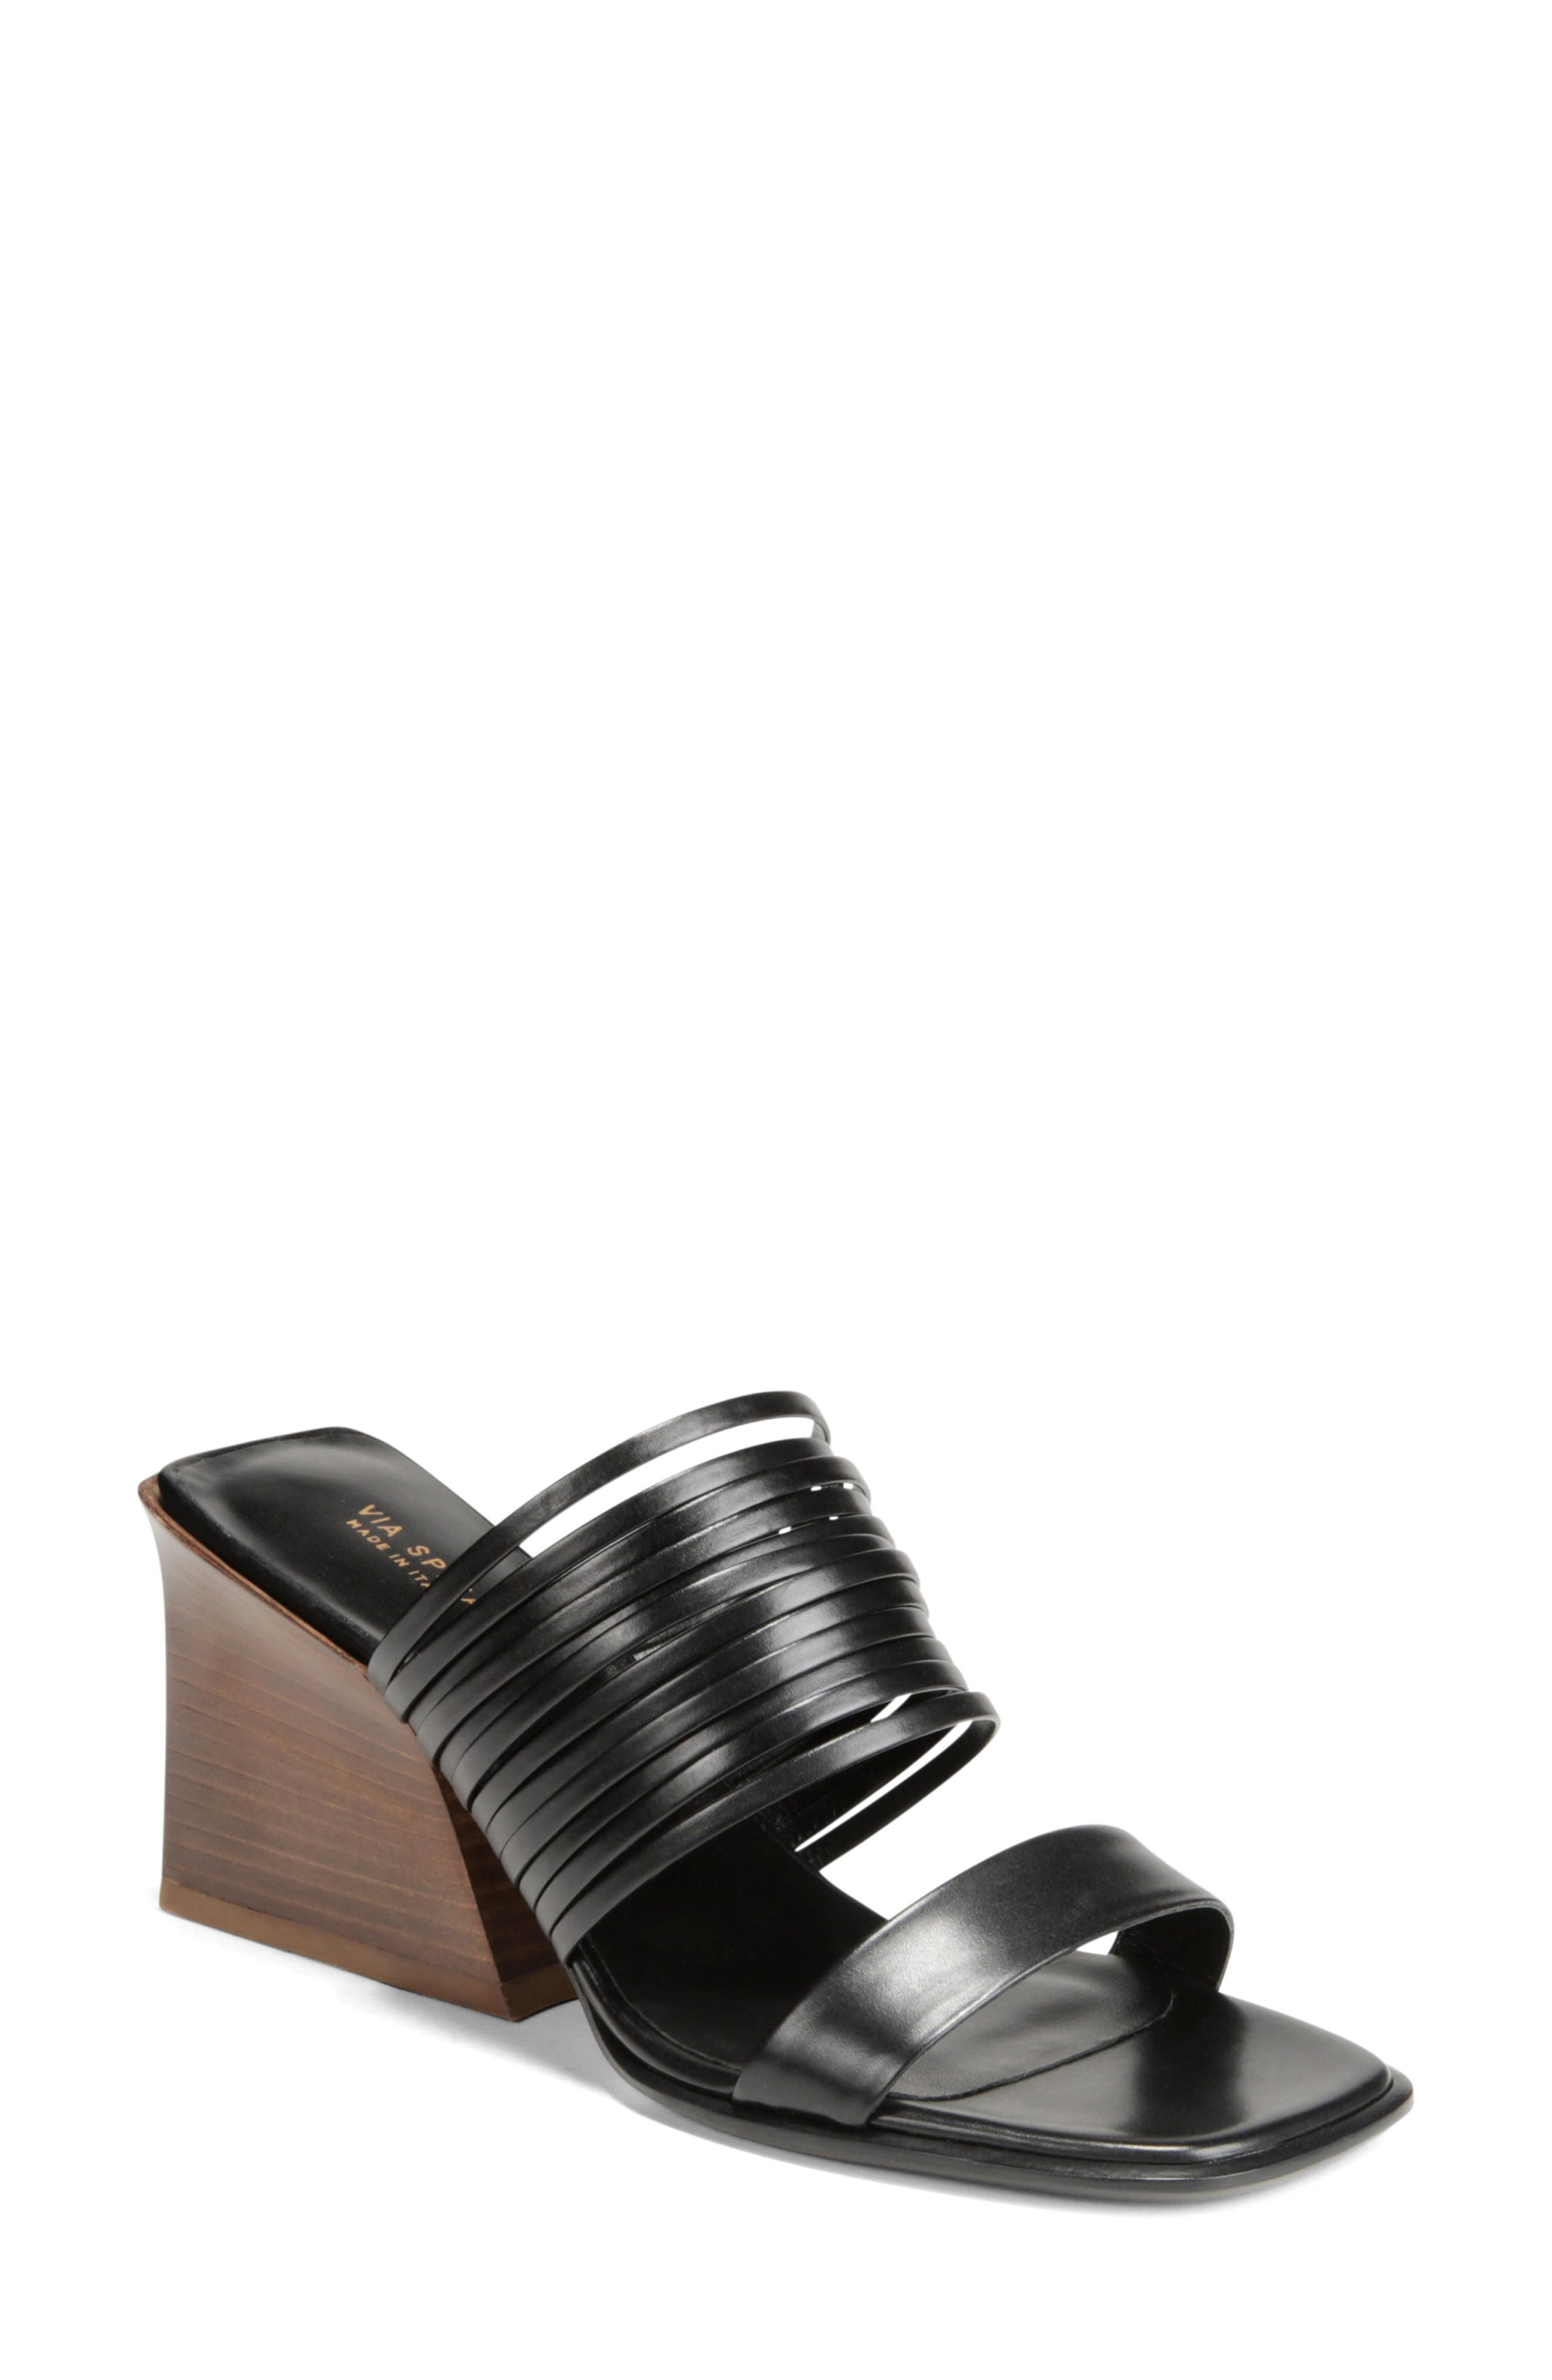 VIA SPIGA Mariam Slide Sandal, Main, color, BLACK